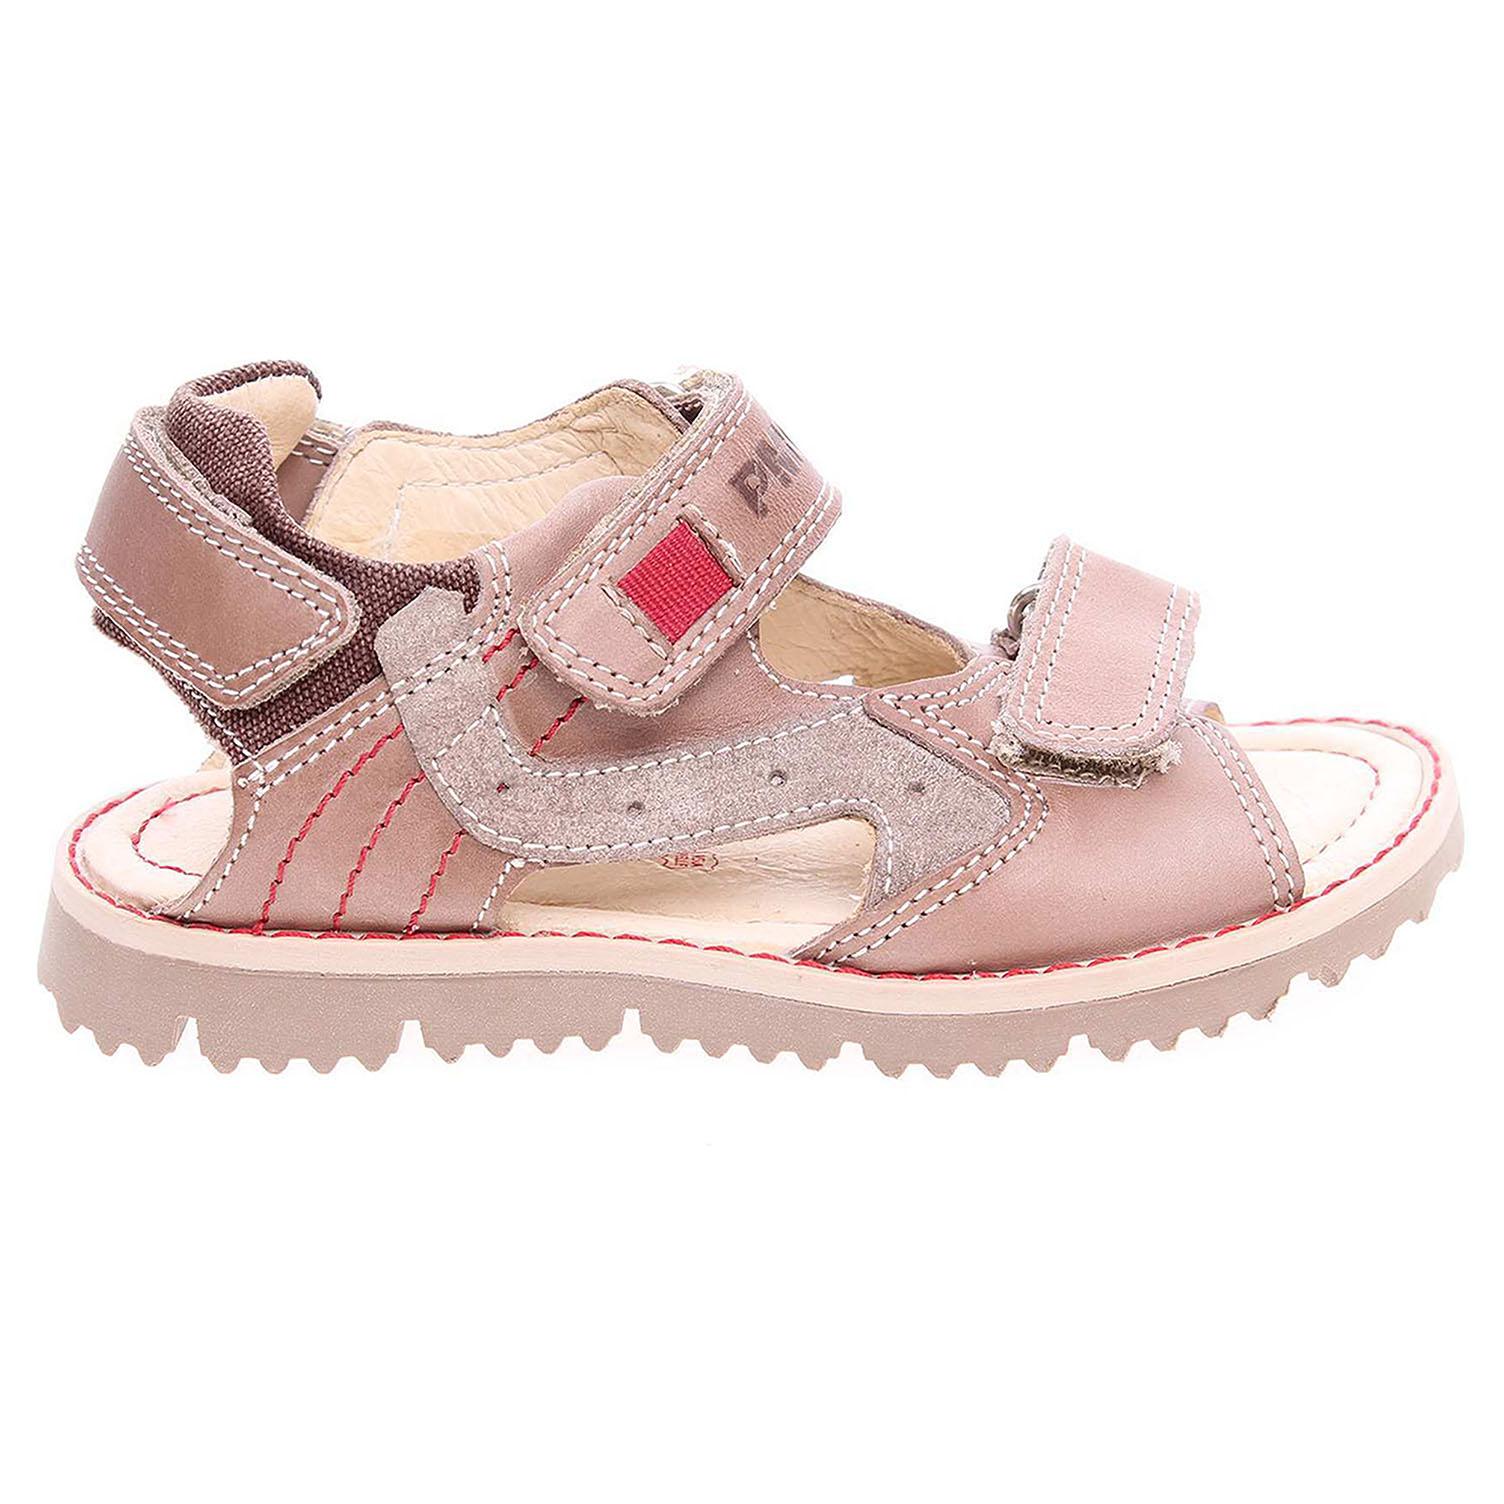 Ecco Primigi chlapecké sandály 7129300 hnědé 29300078